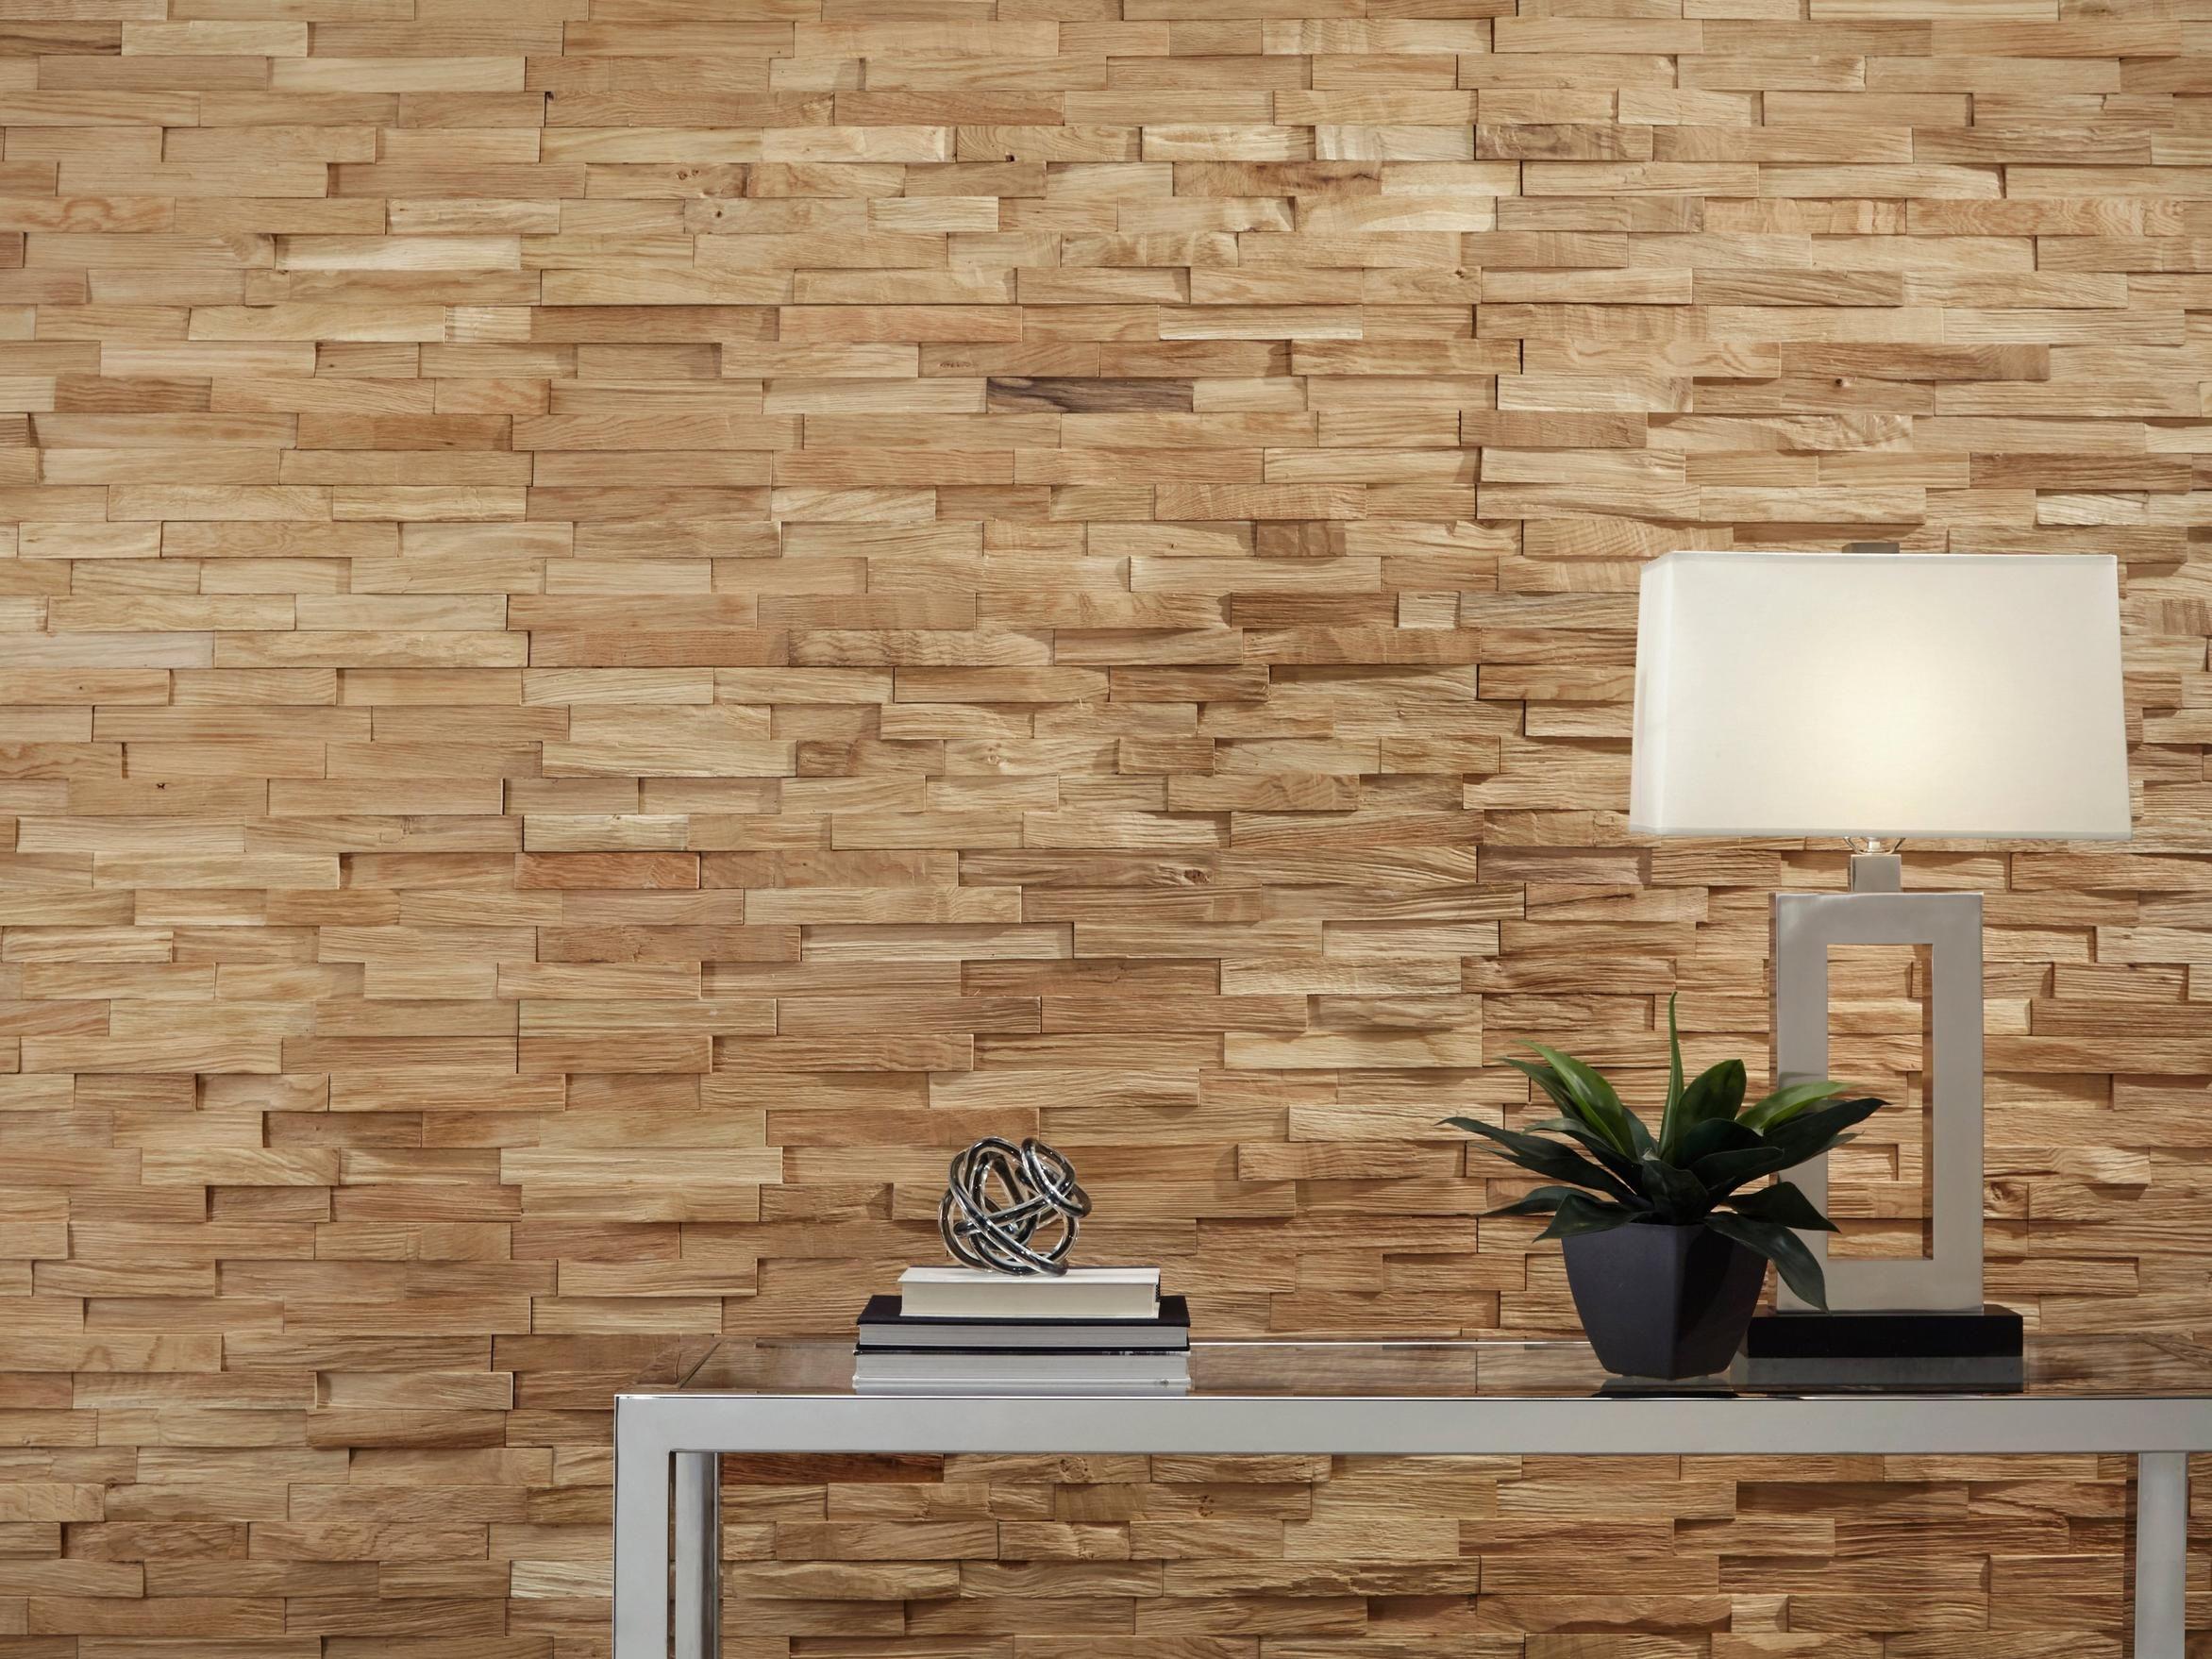 Dimensions Hardwood Natural White Oak Wall Plank